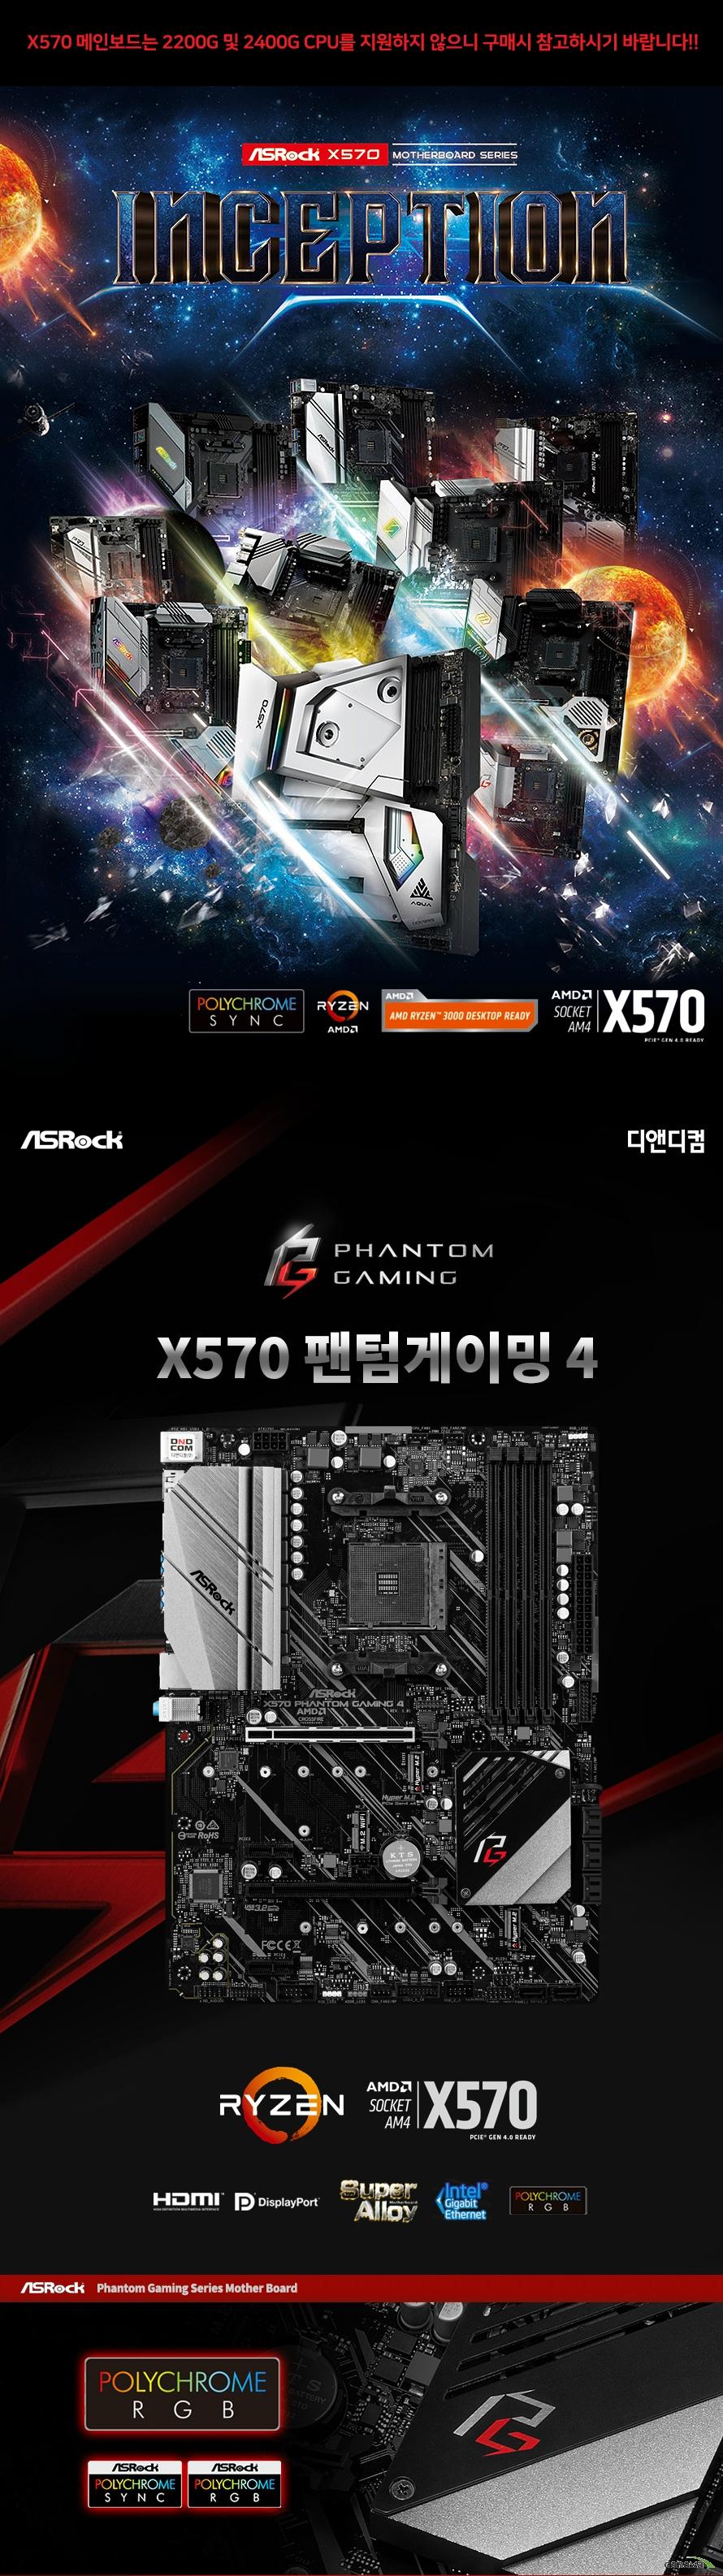 ASRock X570 Phantom Gaming 4 디앤디컴  제품 상세 스펙  AMD am4 소켓 라이젠 2000 및 3000 시리즈 프로세서 지원 인터실 디지털 PWM  10파워 페이즈  Amd x570칩셋 적용  듀얼채널 ddr4 메모리 최대 128기가바이트 지원  Amd 라이젠 마티즈 cpu  Ddr4 4066+ 3466 3200 2933 2667 2400 2133 ecc 및 non ecc un buffered memory 지원  32비트 운영체제환경에서는 실제 메모리 사이즈가 4기가바이트 이하로 인식될 수 있습니다.  확장 슬롯  Amd 라이젠 마티즈 cpu  Pcie 4.0 16배속 슬롯 2개 지원   Amd 라이젠 피나클릿지 및 피카소 cpu Pcie 3.0 16배속 슬롯 2개 지원 Pcie 4.0 1배속 슬롯 2개 지원  Vertical m.2 keyE WiFi BT 소켓 1개 지원  Amd 쿼드 크로스파이어 및 크로스 파이어 지원  Sata3 소켓 8개 지원 (raid 0 1 10 및 ncq AHCI및 HOT PLUG) 하이퍼 M.2 소켓 2개 지원  Usb 3.2 gen2 a+c 포트 지원 Usb 3.2 gen1 포트 8개 지원 Usb 2.0 전면 포트 2개 지원  인텔 i211at 기가비트 랜 지원  리얼텍 alc1200 7.1채널 hd 오디오 코덱 지원 120데시벨 snr dac with differential amplifier 지원  마이크로소프트 윈도우 10 64비트 운영체제 지원 ATX 폼팩터 크기 길이 30.5센티미터 넓이 22.9센티미터 KC 인증번호 R R ASR X570GAMING4  제조사의 사정에 따라 사전고지 없이 일부 제품사양이 변경될 수 있으며 부품 호환 등 더 자세한 정보는 제조사 홈페이지 또는 제품 매뉴얼을 참고해주시기 바랍니다.